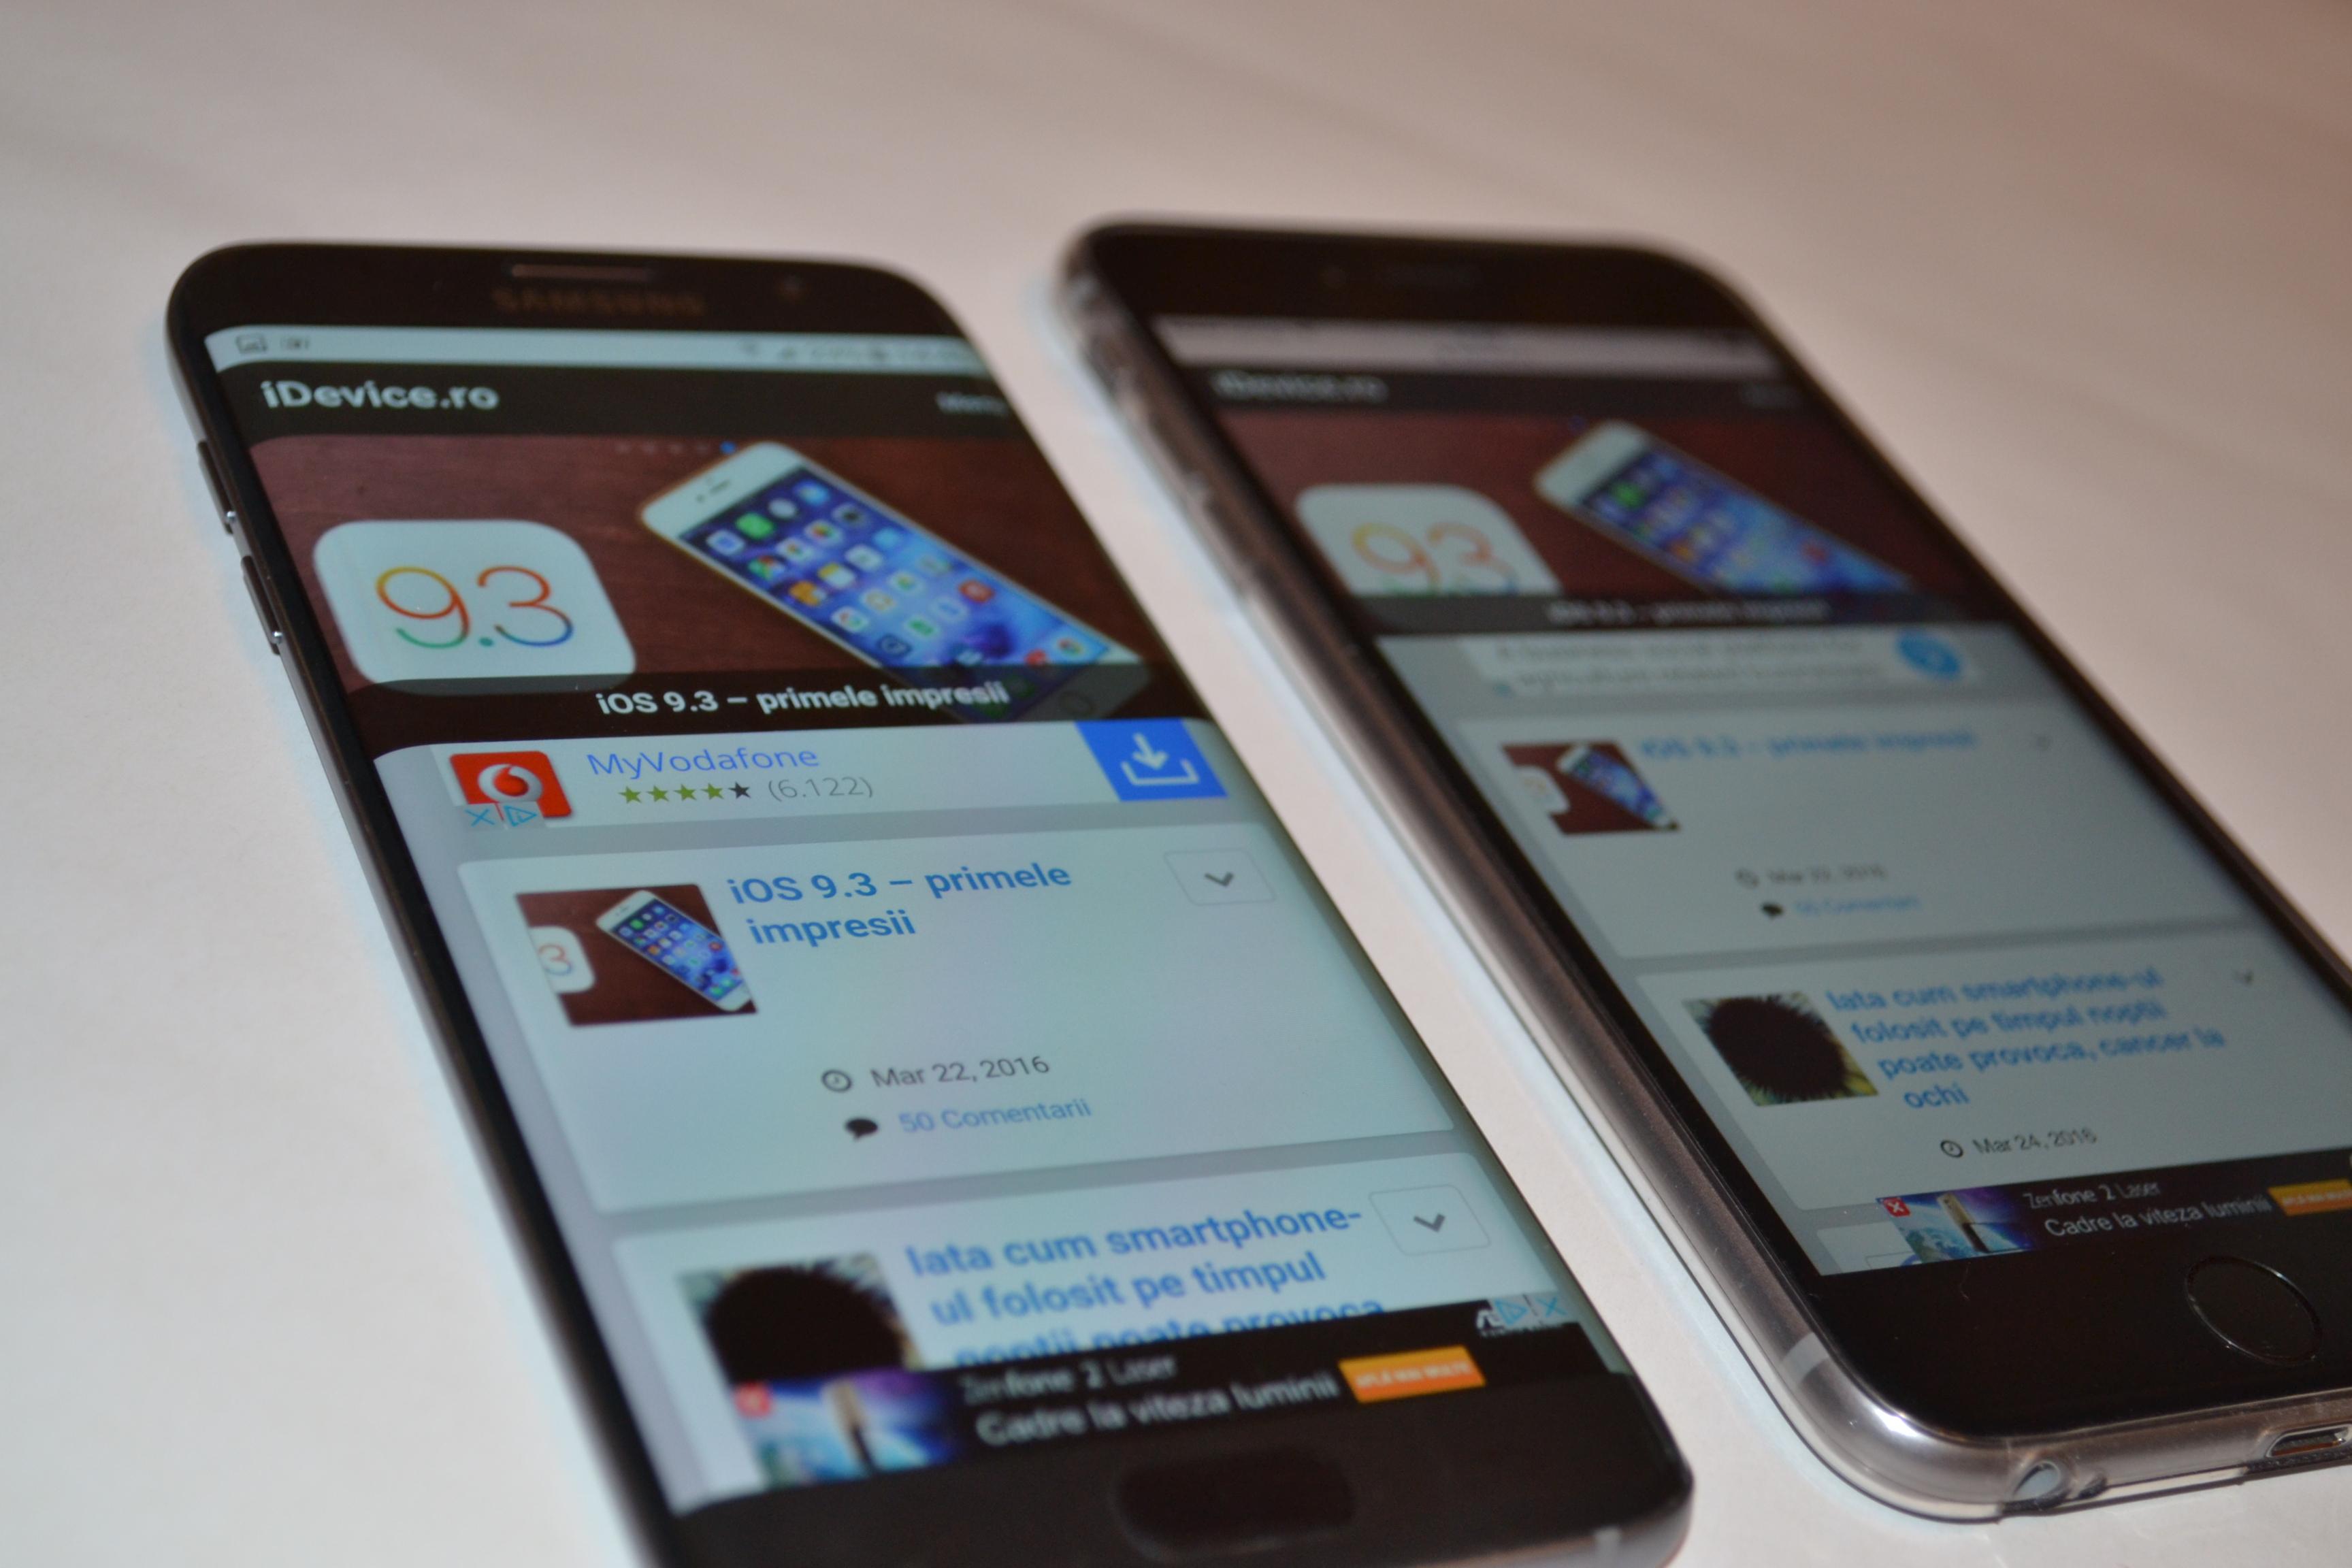 Galaxy S7 Edge vs iPhone 6S Plus performante iDevice.ro